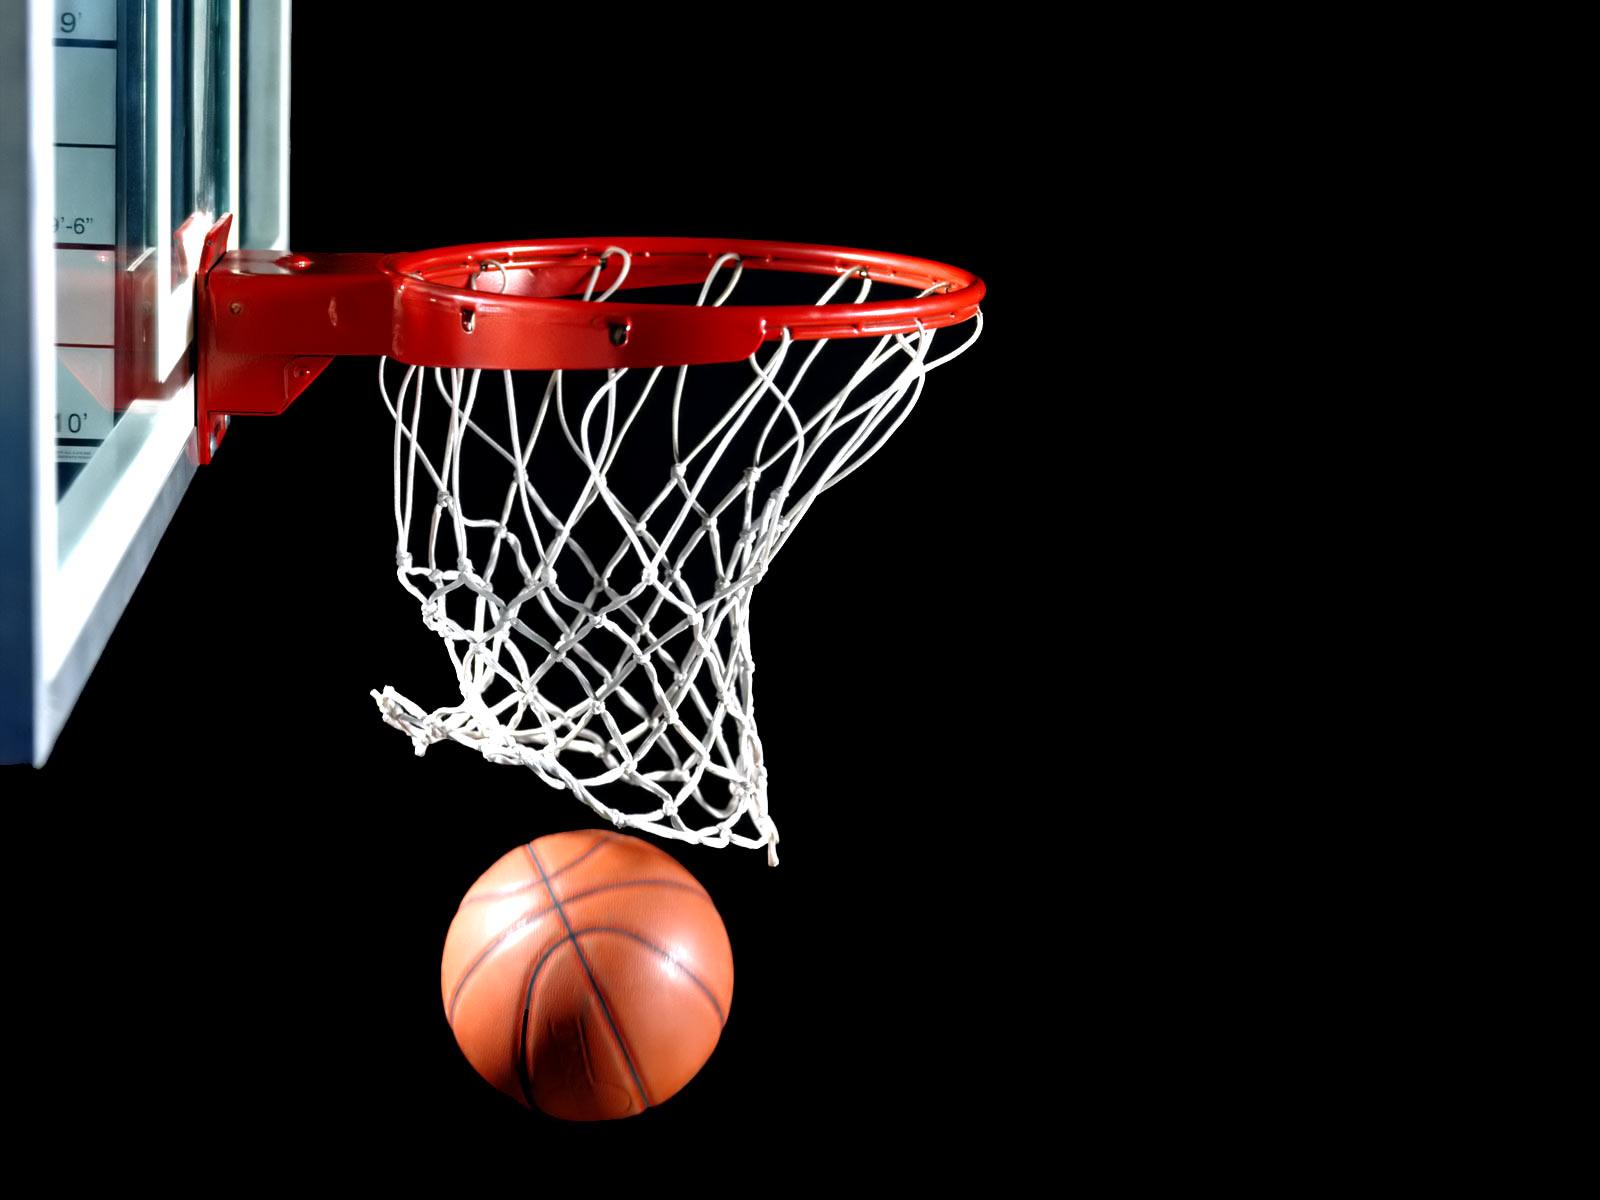 http://1.bp.blogspot.com/_sl7lo-D32tg/TKdbBftOmeI/AAAAAAAABdw/3YtYjg_qde4/s1600/basketball-hoop-wallpaper.jpg